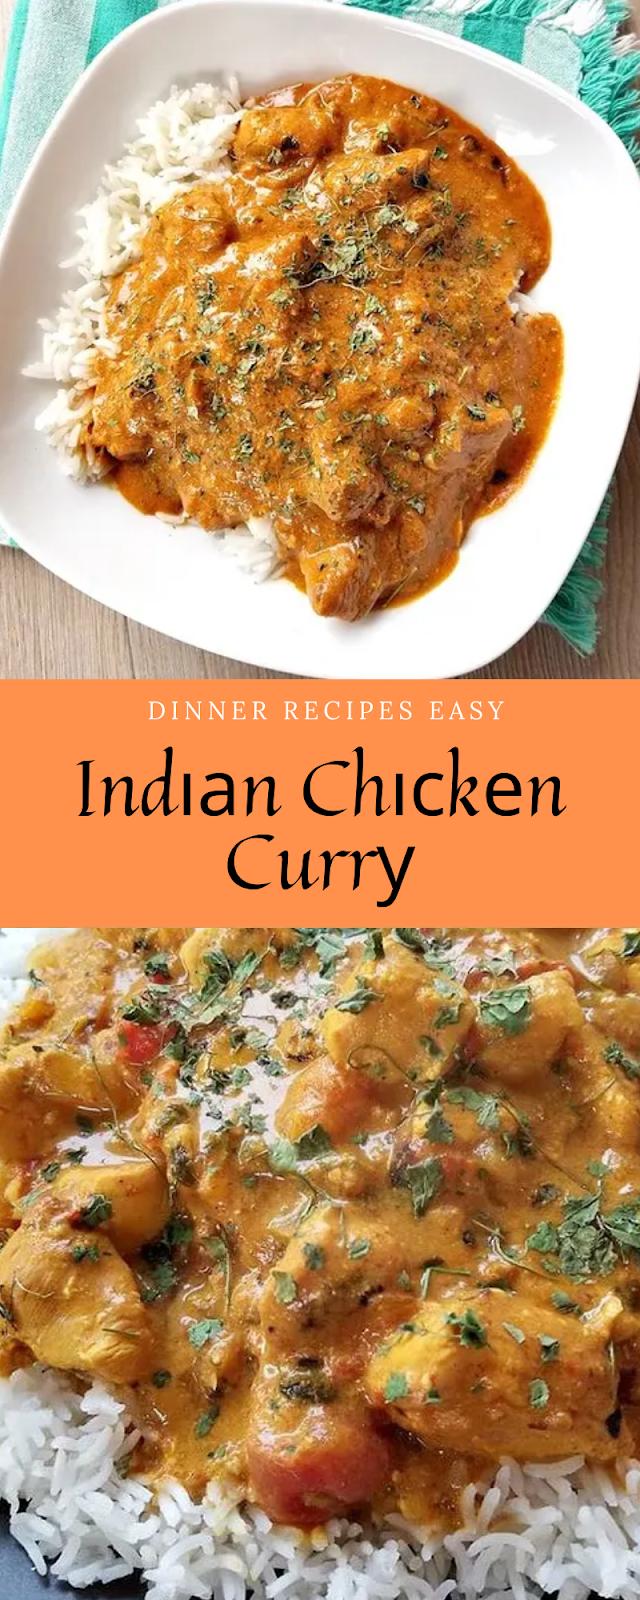 Dinner Recipes Easy   Indіаn Chісkеn Currу #chickenbreastrecipeseasy